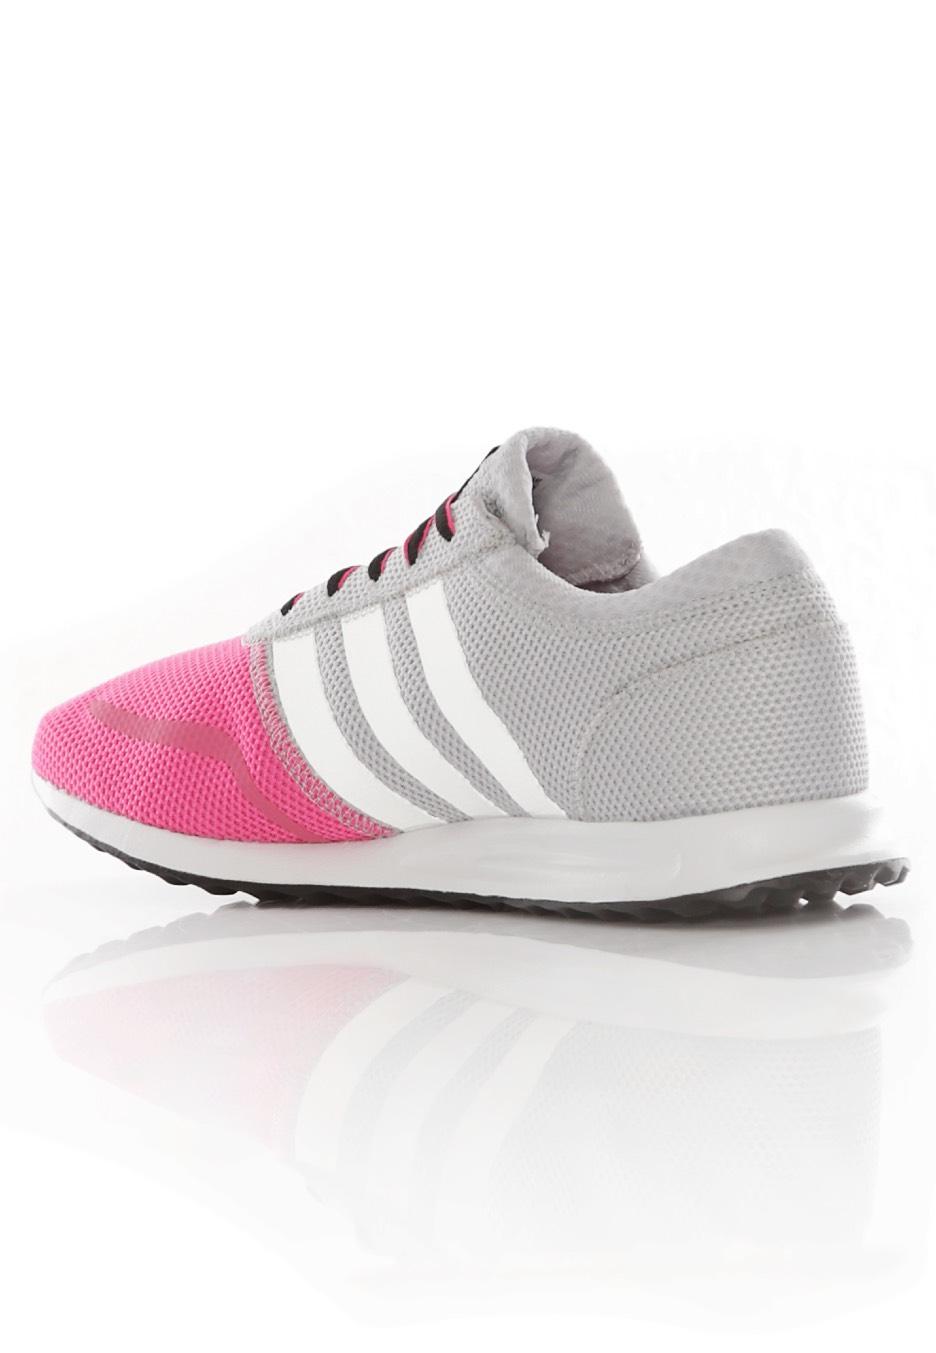 750e69e47b6 ... Adidas - Los Angeles K Light Solid Grey Ftwr White Shock Pink - Girl ...